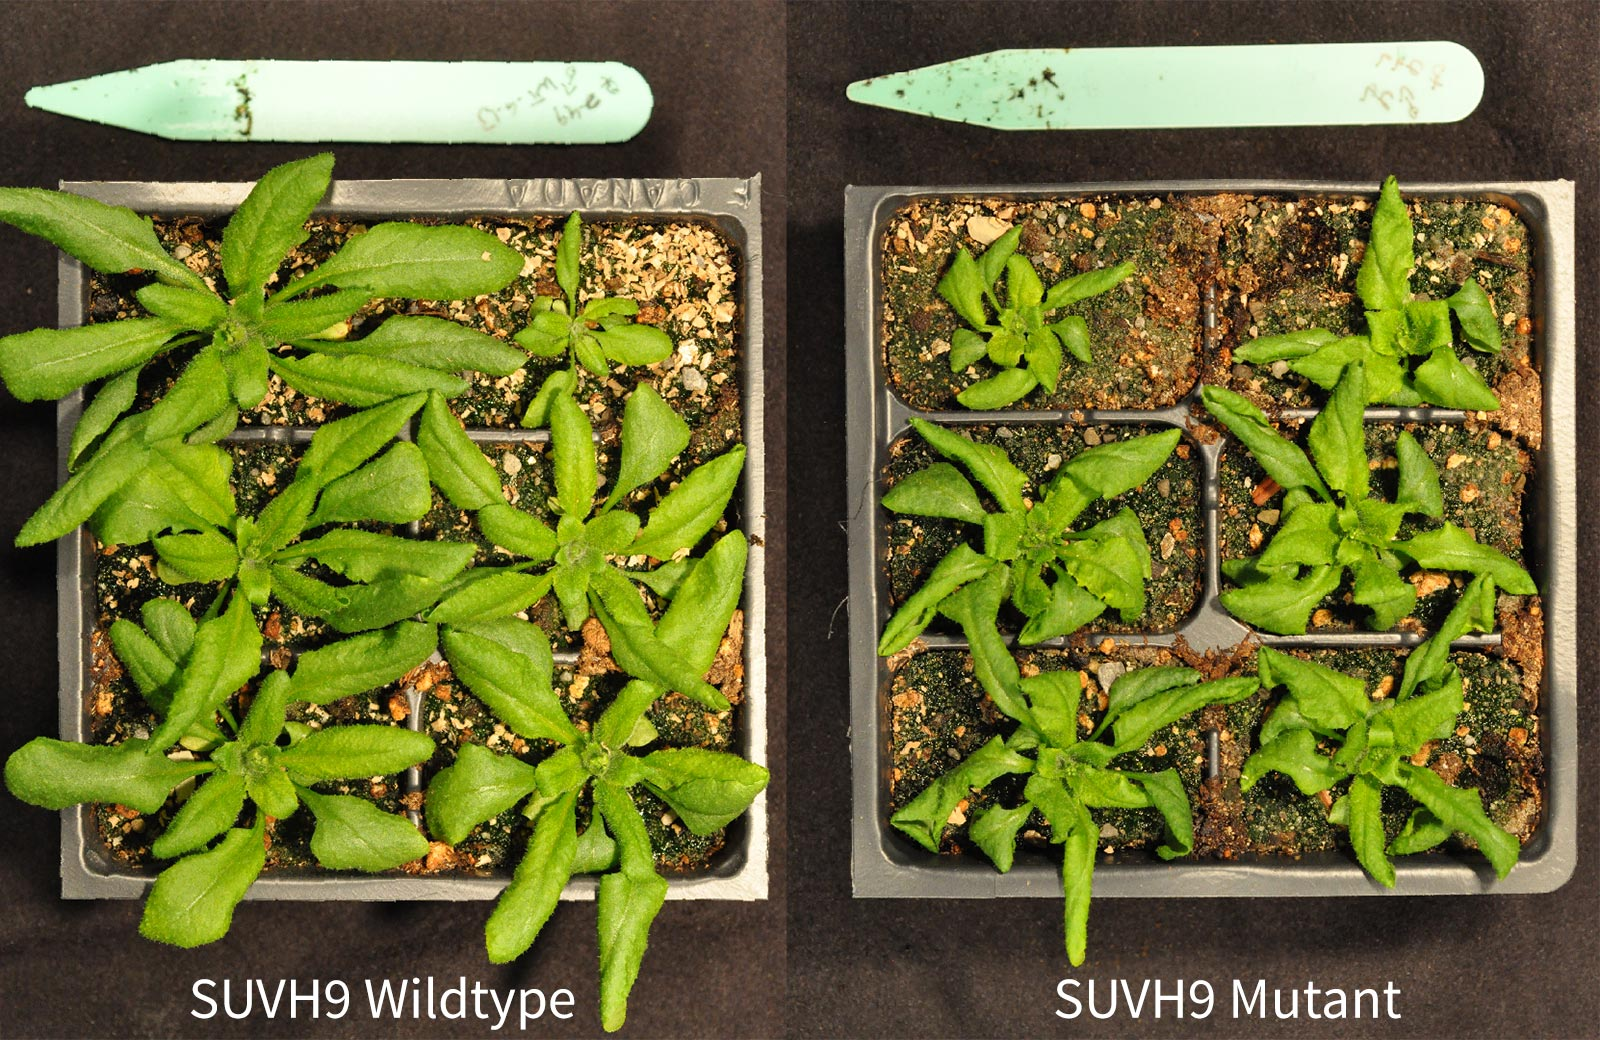 photo of two Arabidopsis thaliana plants